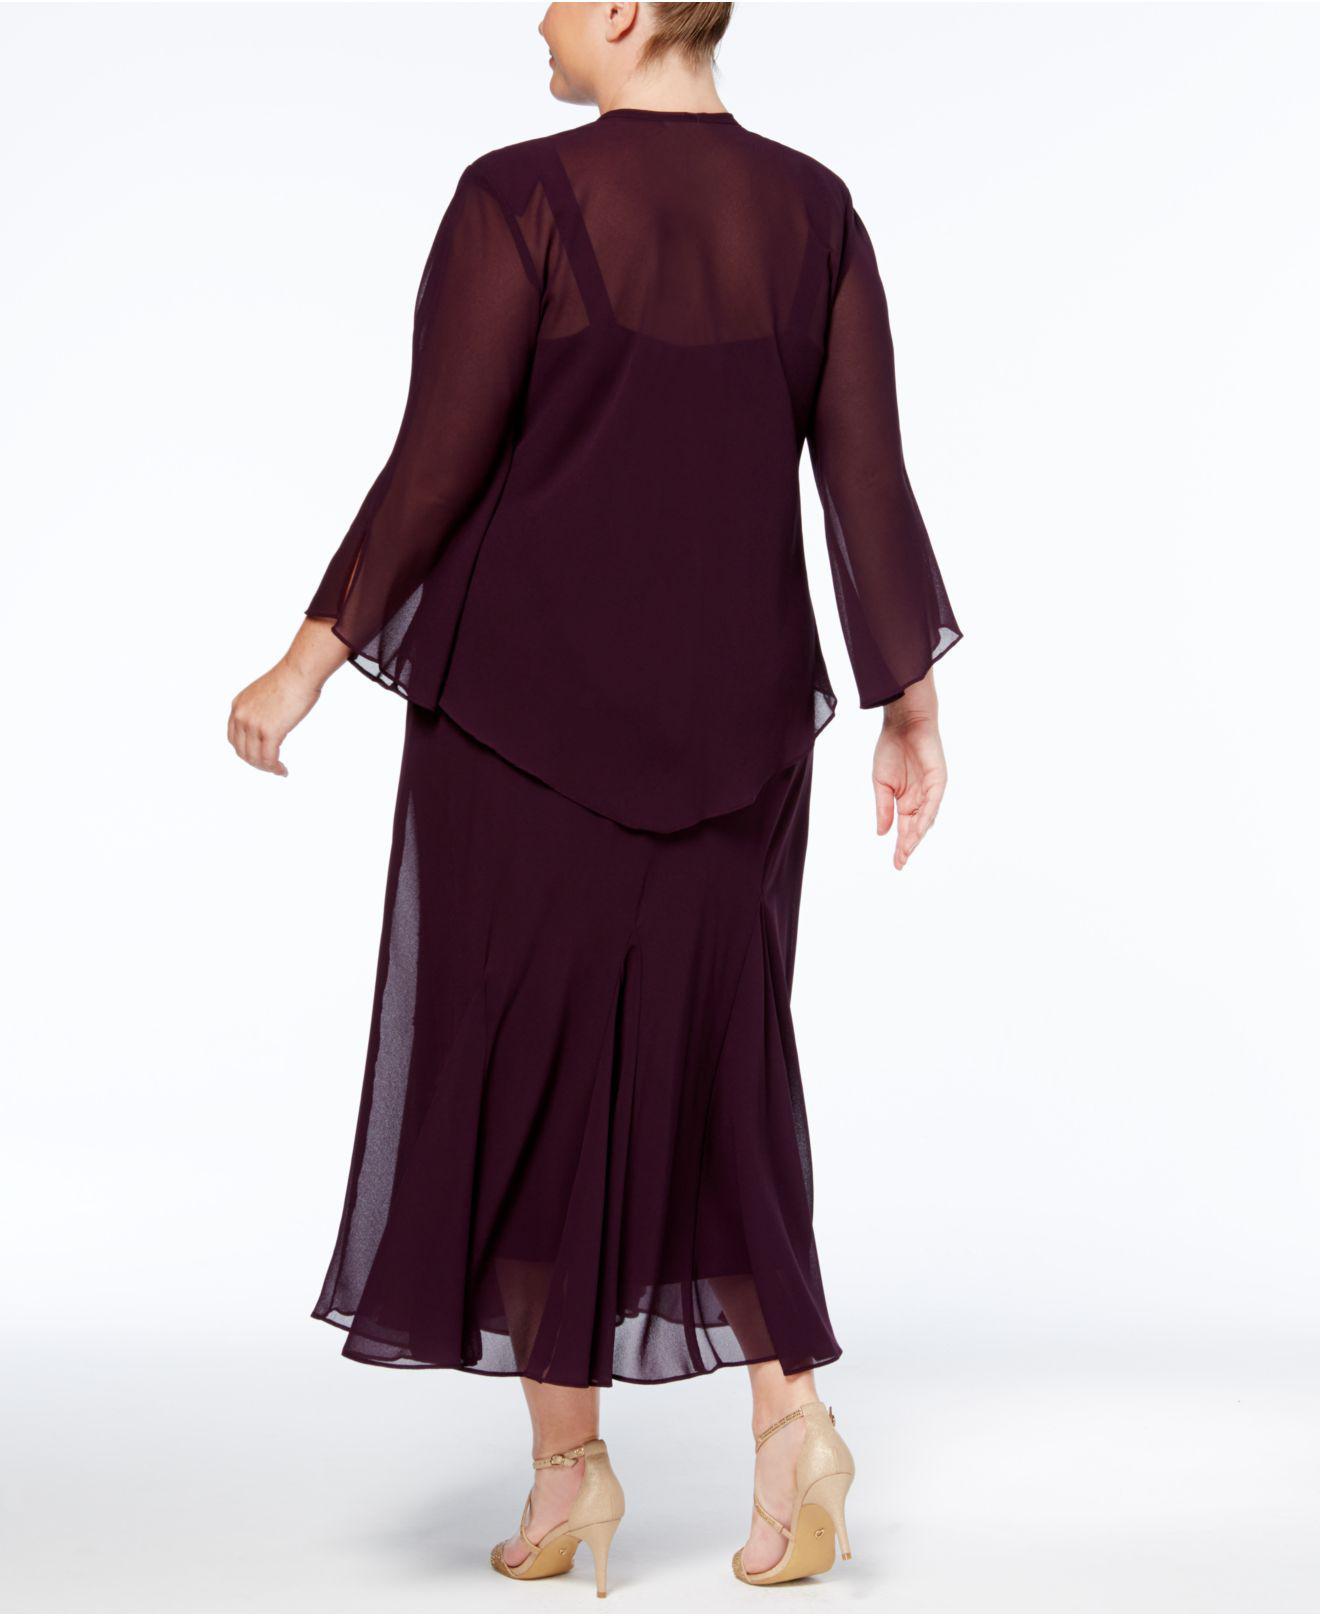 Lyst - R & M Richards Plus Size Beaded V-neck Dress And Jacket